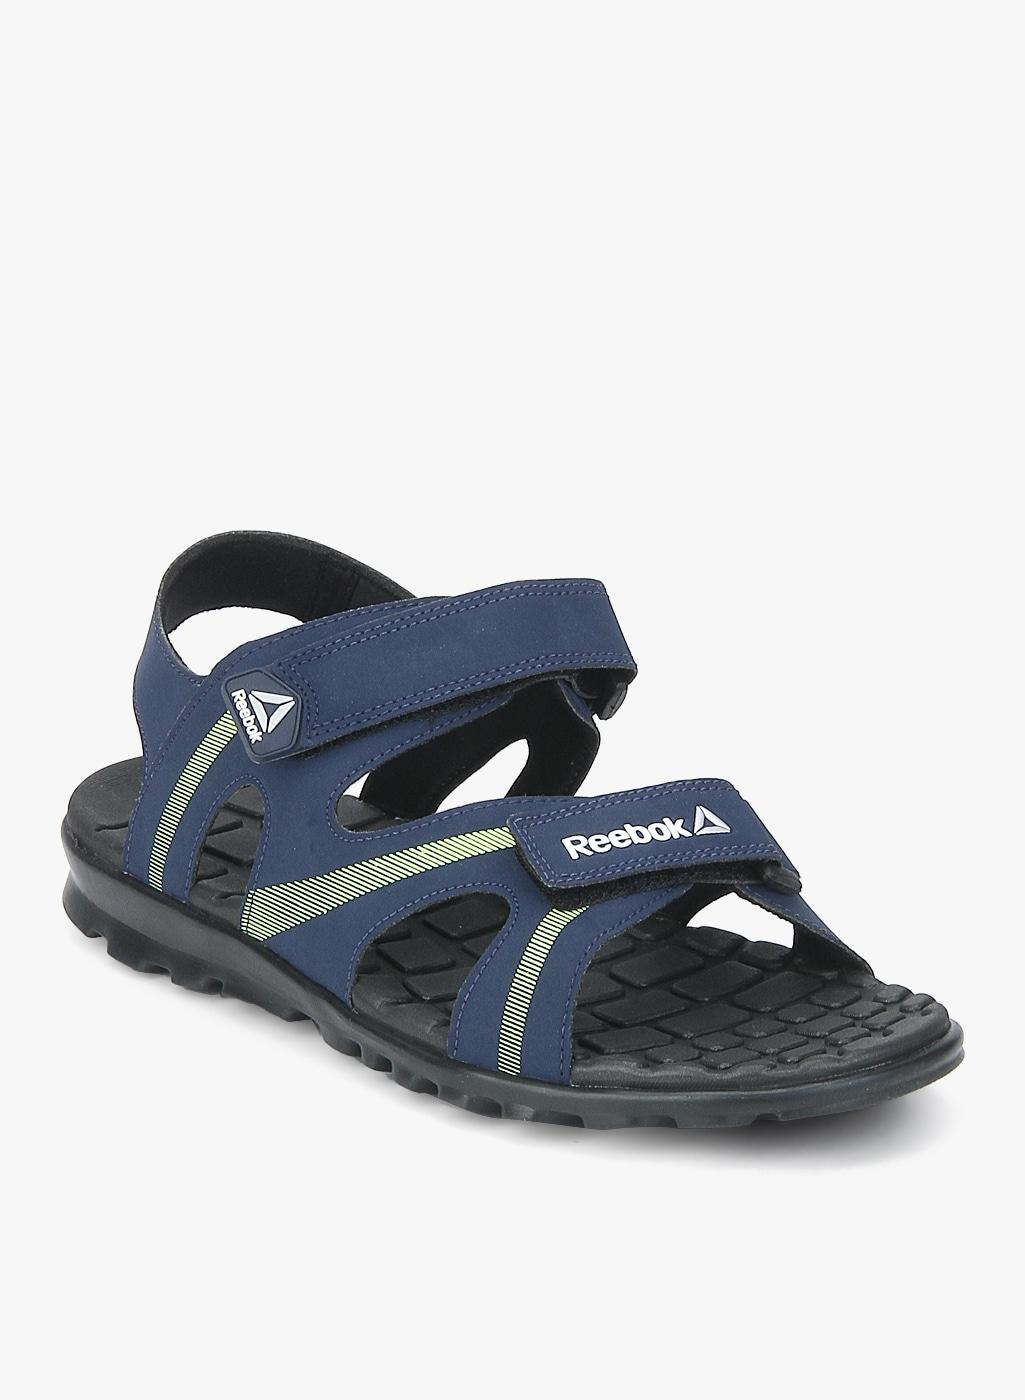 1a0f26aff Reebok Swimwear Sports Sandals - Buy Reebok Swimwear Sports Sandals online  in India